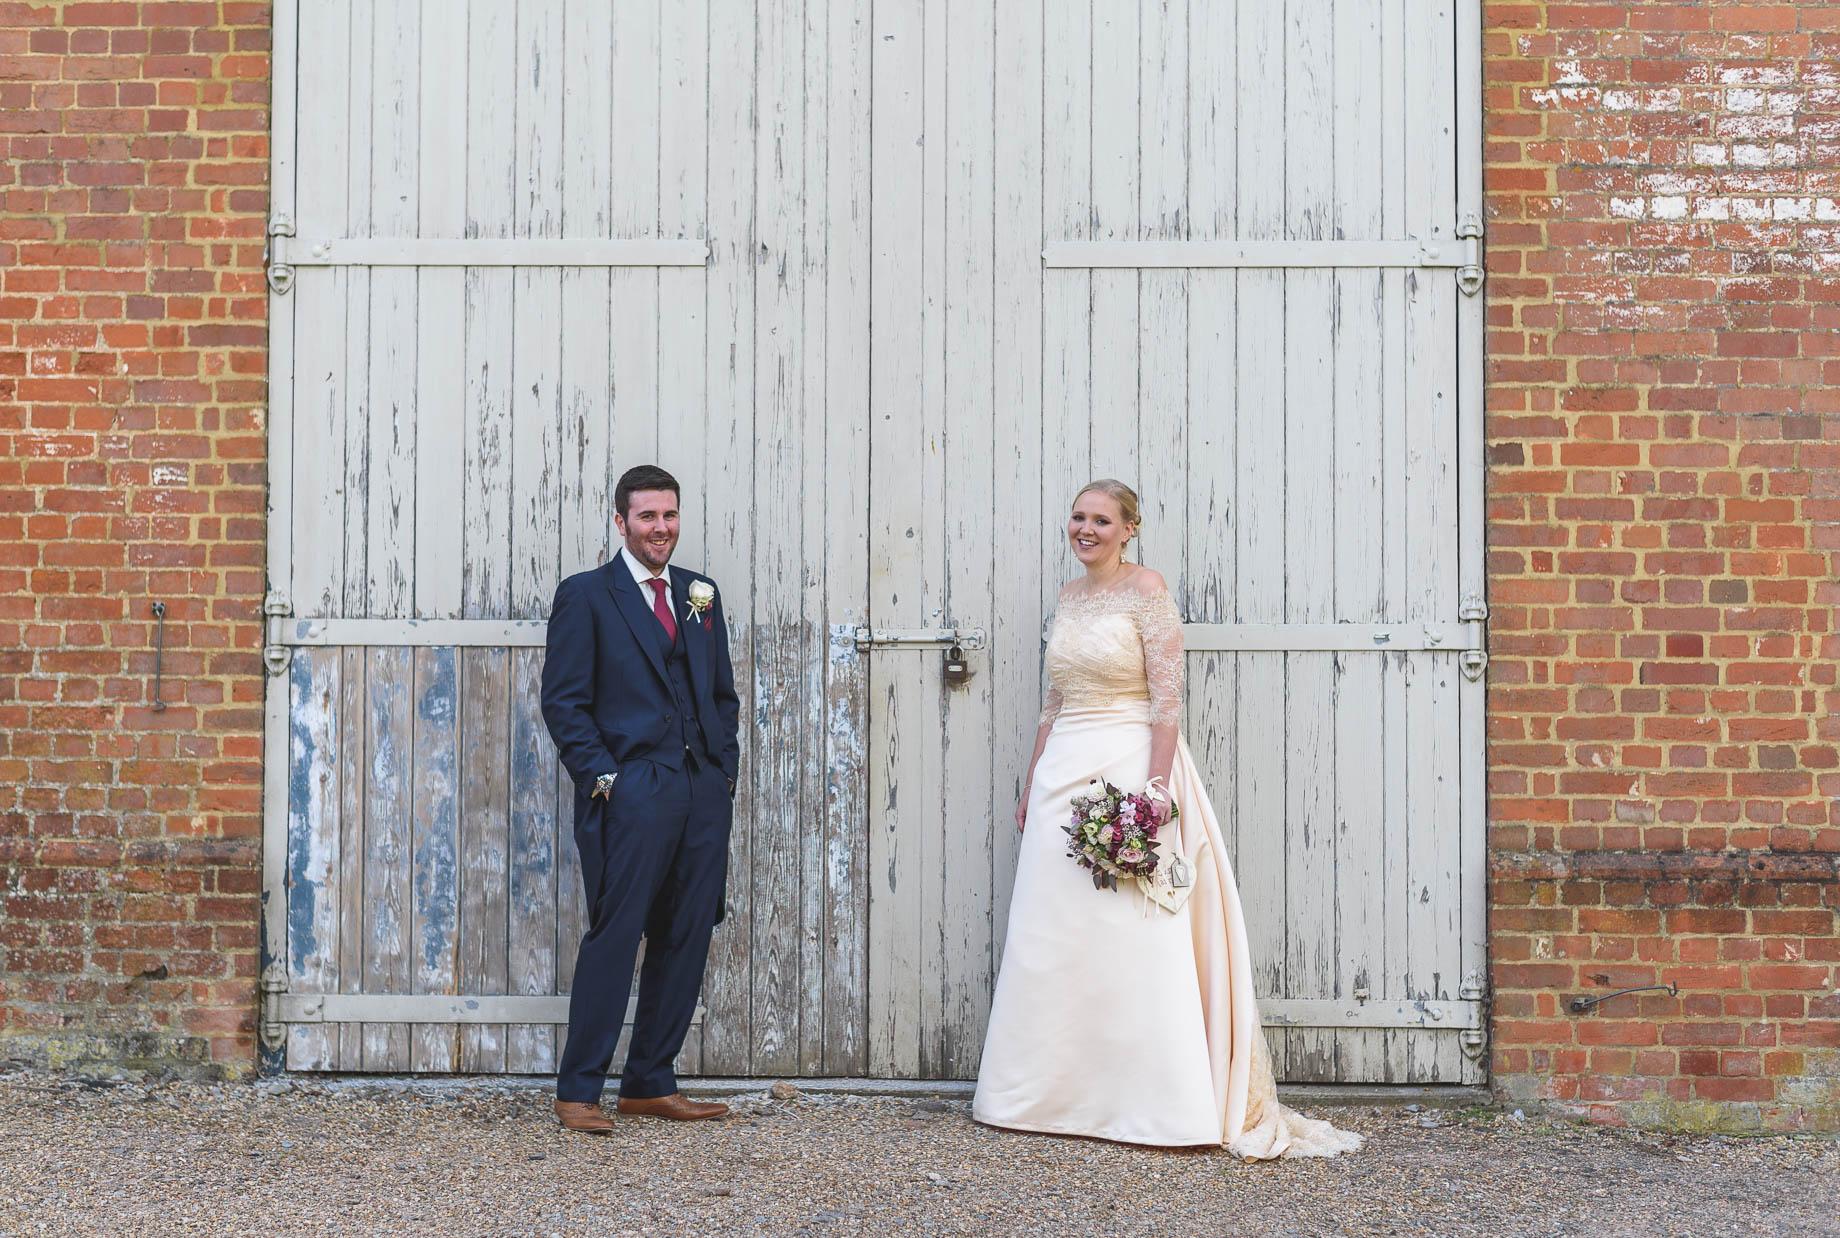 Bury Court Barn wedding photography - Guy Collier - Hannah and Mark (108 of 191)